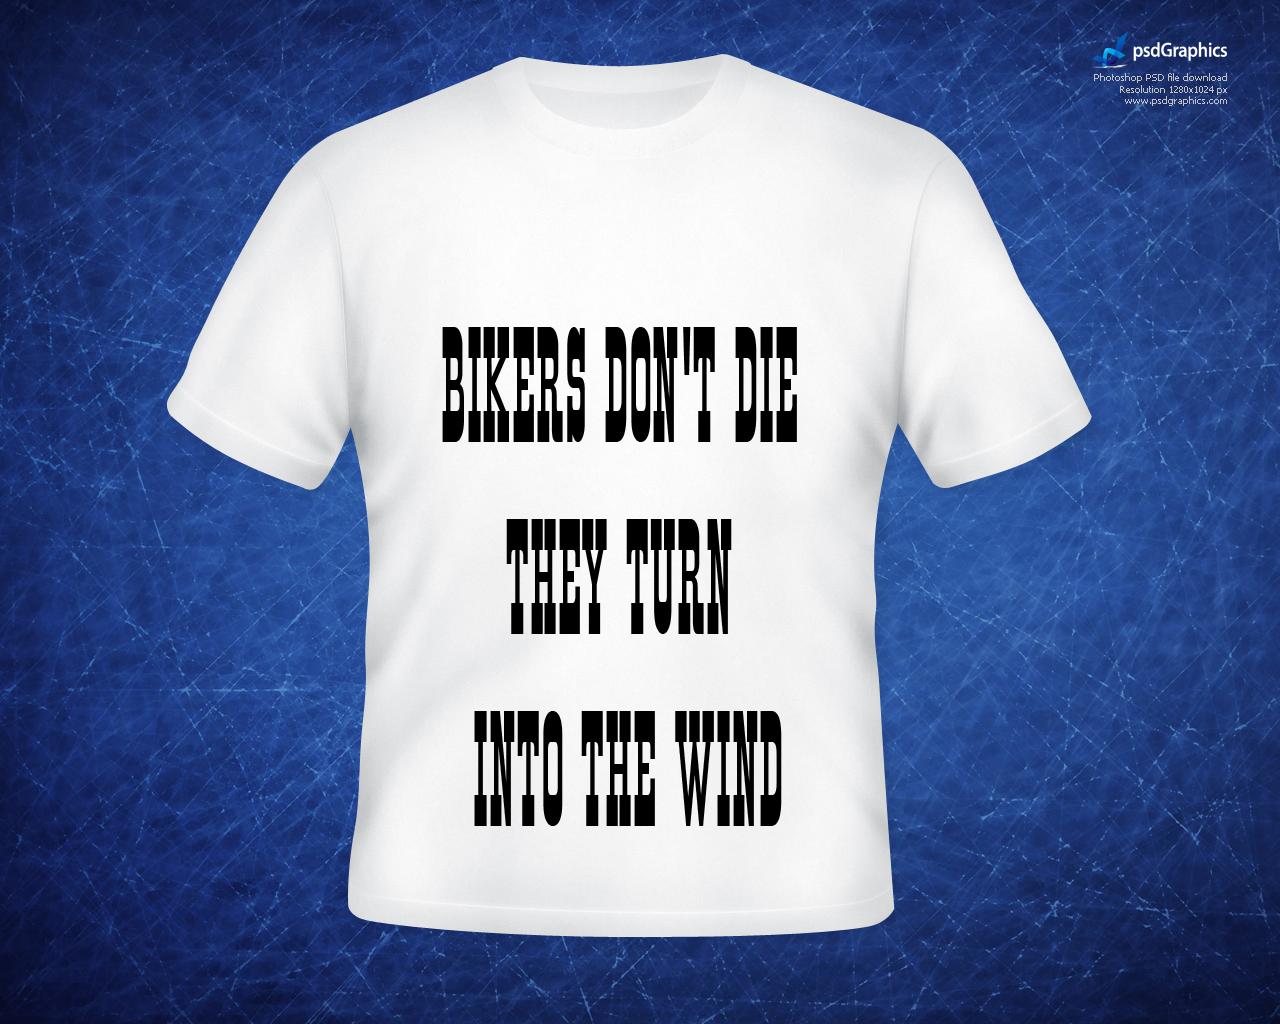 Разработка дизайна футболок  фото f_0695ba128c03e839.jpg